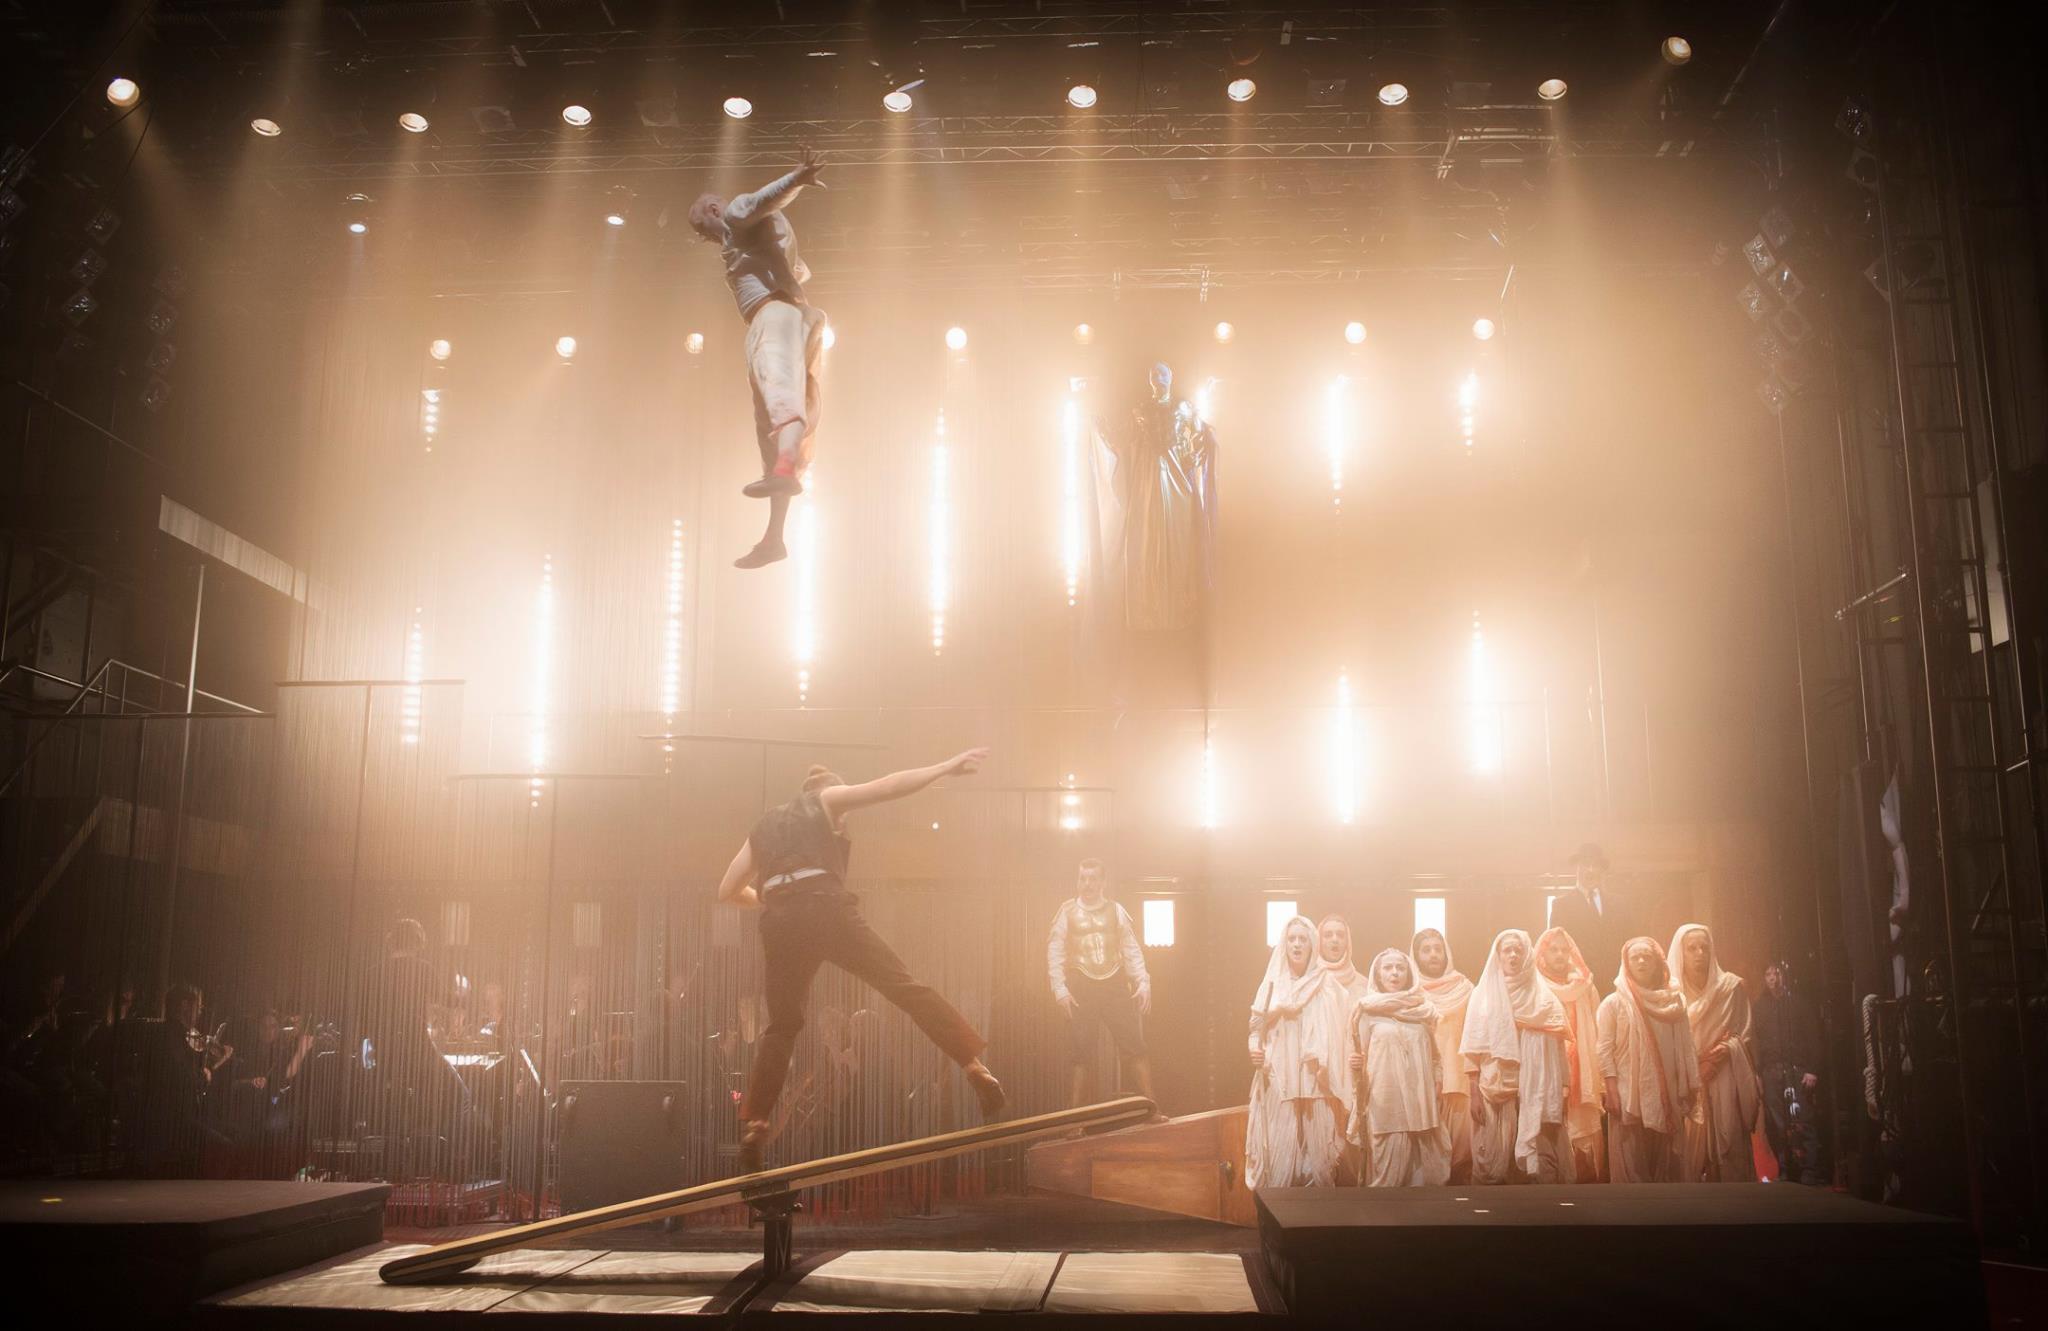 Satyagraha, Cirkus Cirkör